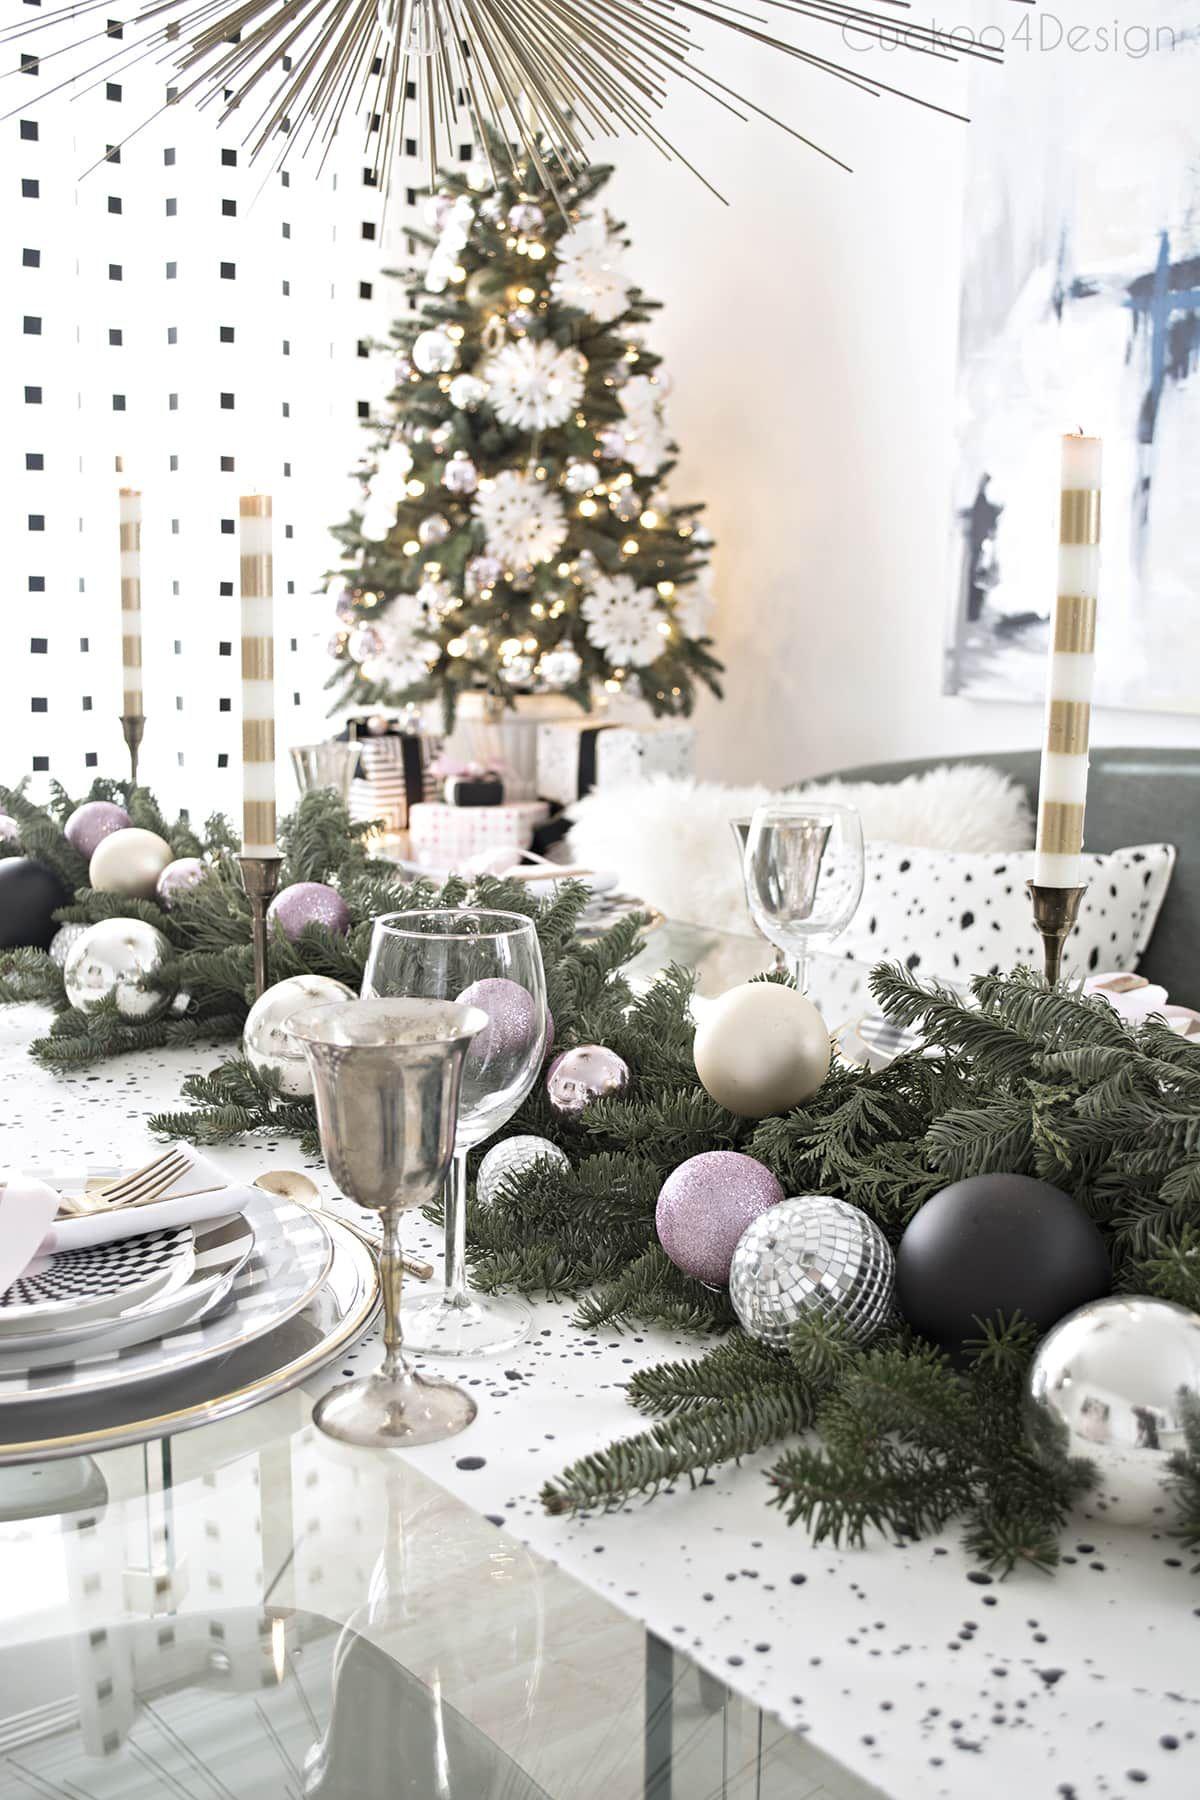 Better Homes And Gardens Christmas Ideas Home Tour Christmas